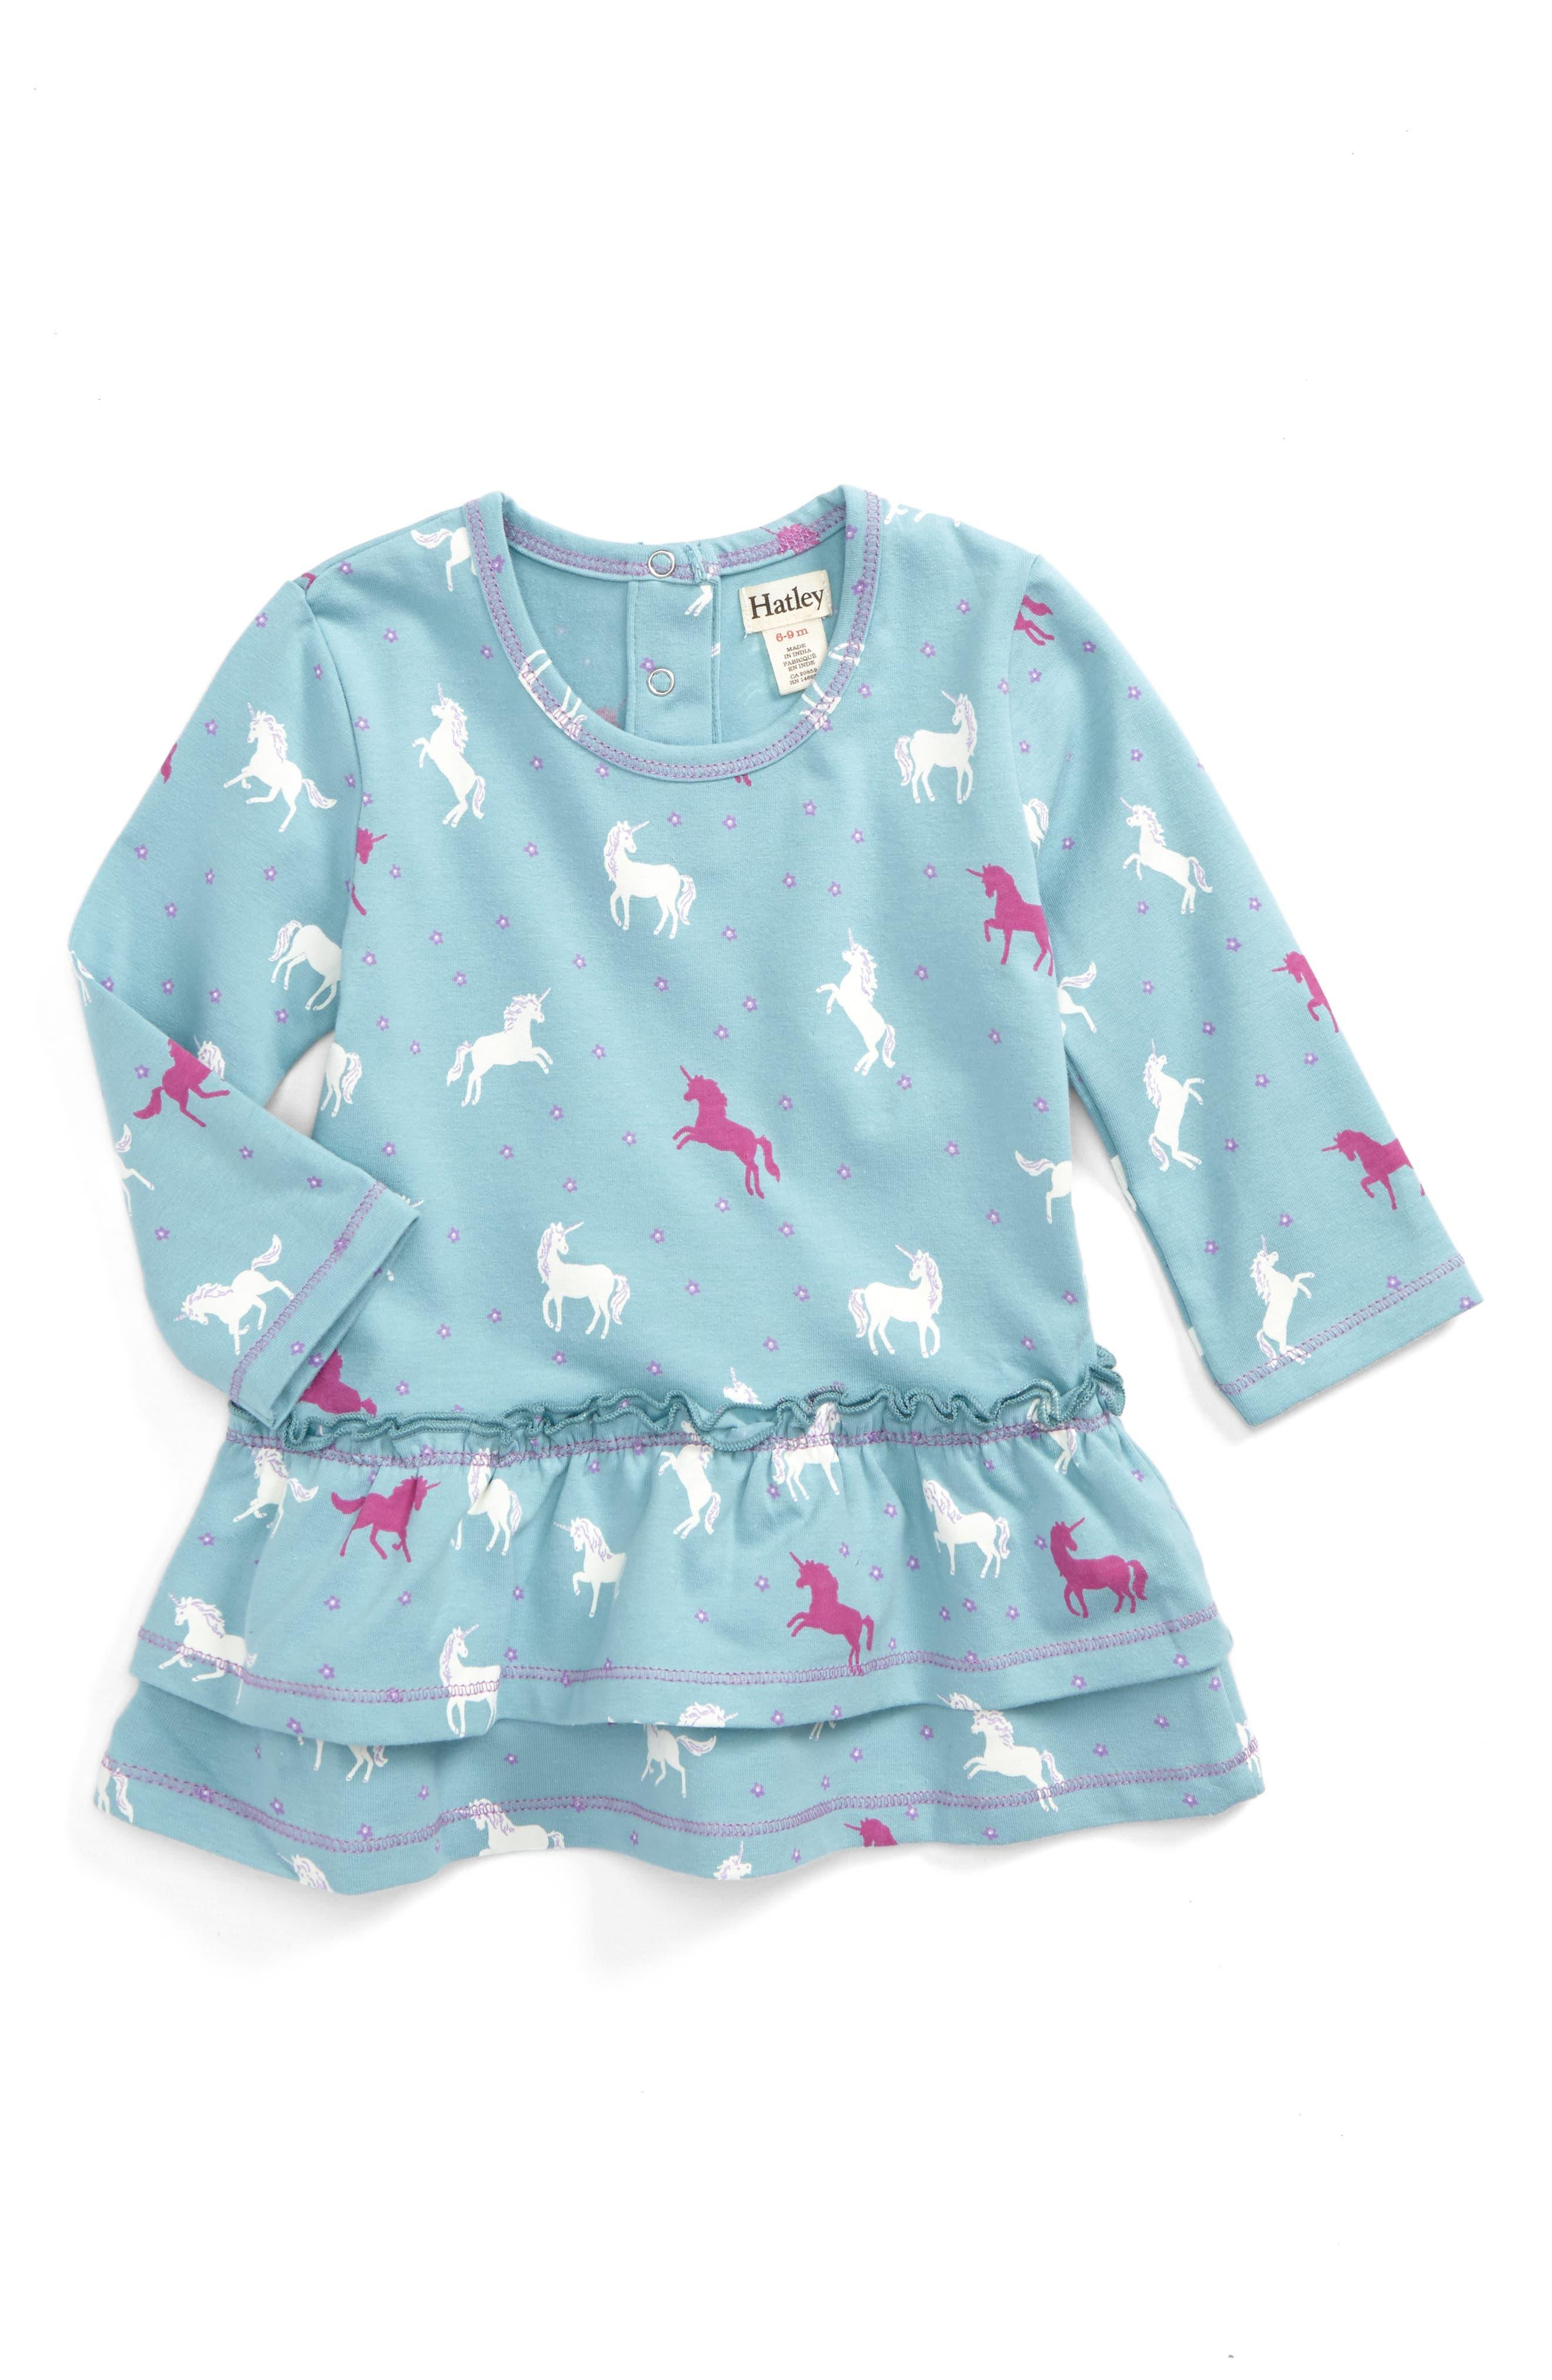 Hatley Print Layered Dress (Baby Girls)